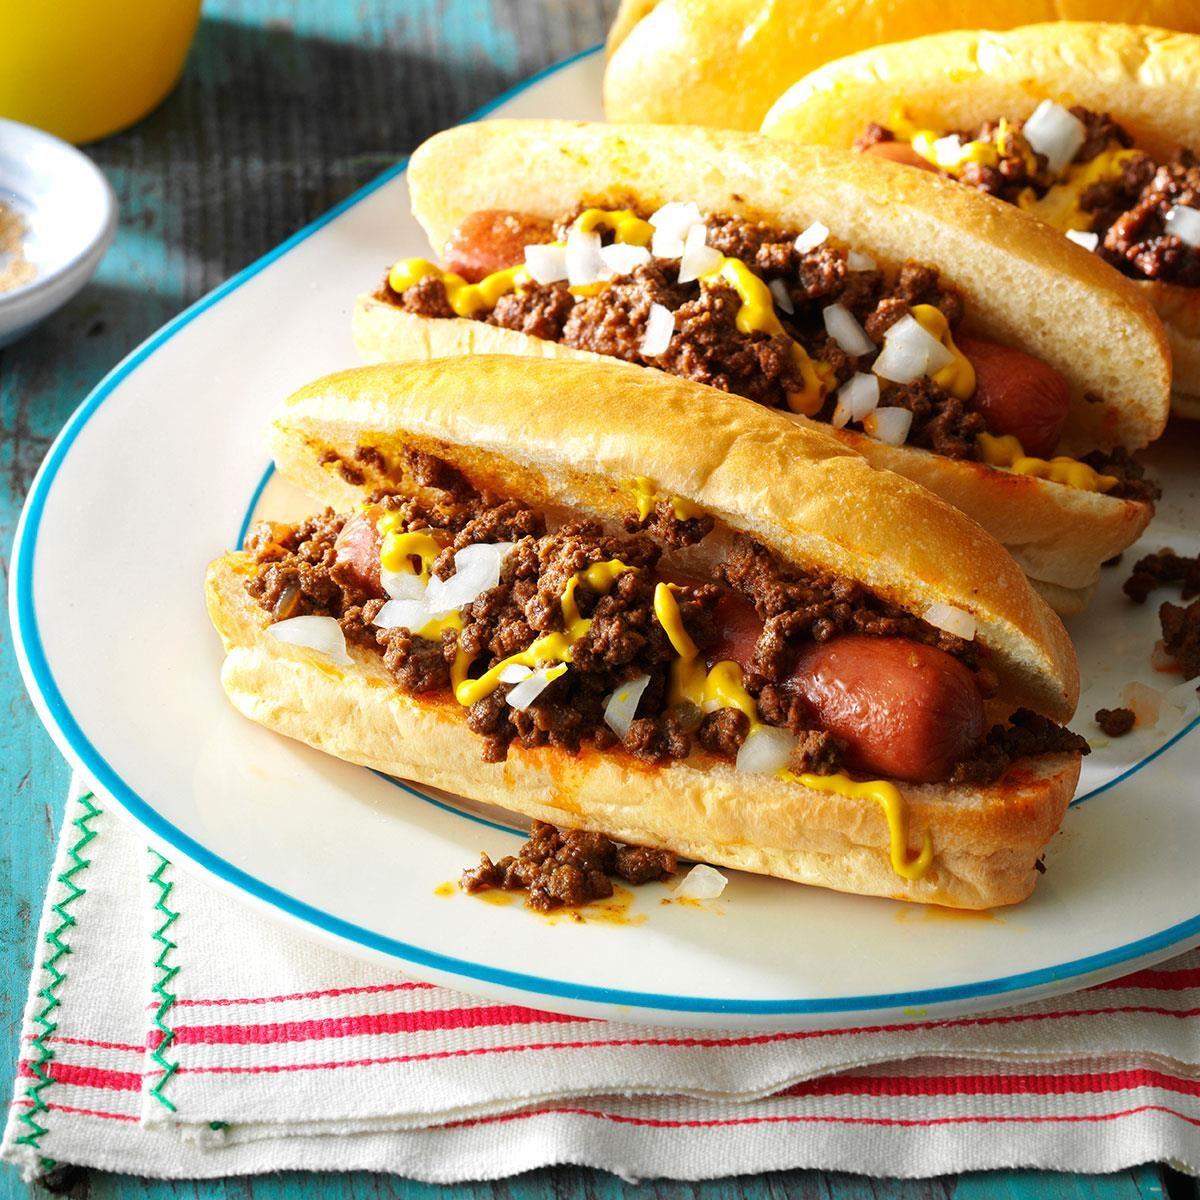 Saturday: Rhode Island Hot Wieners